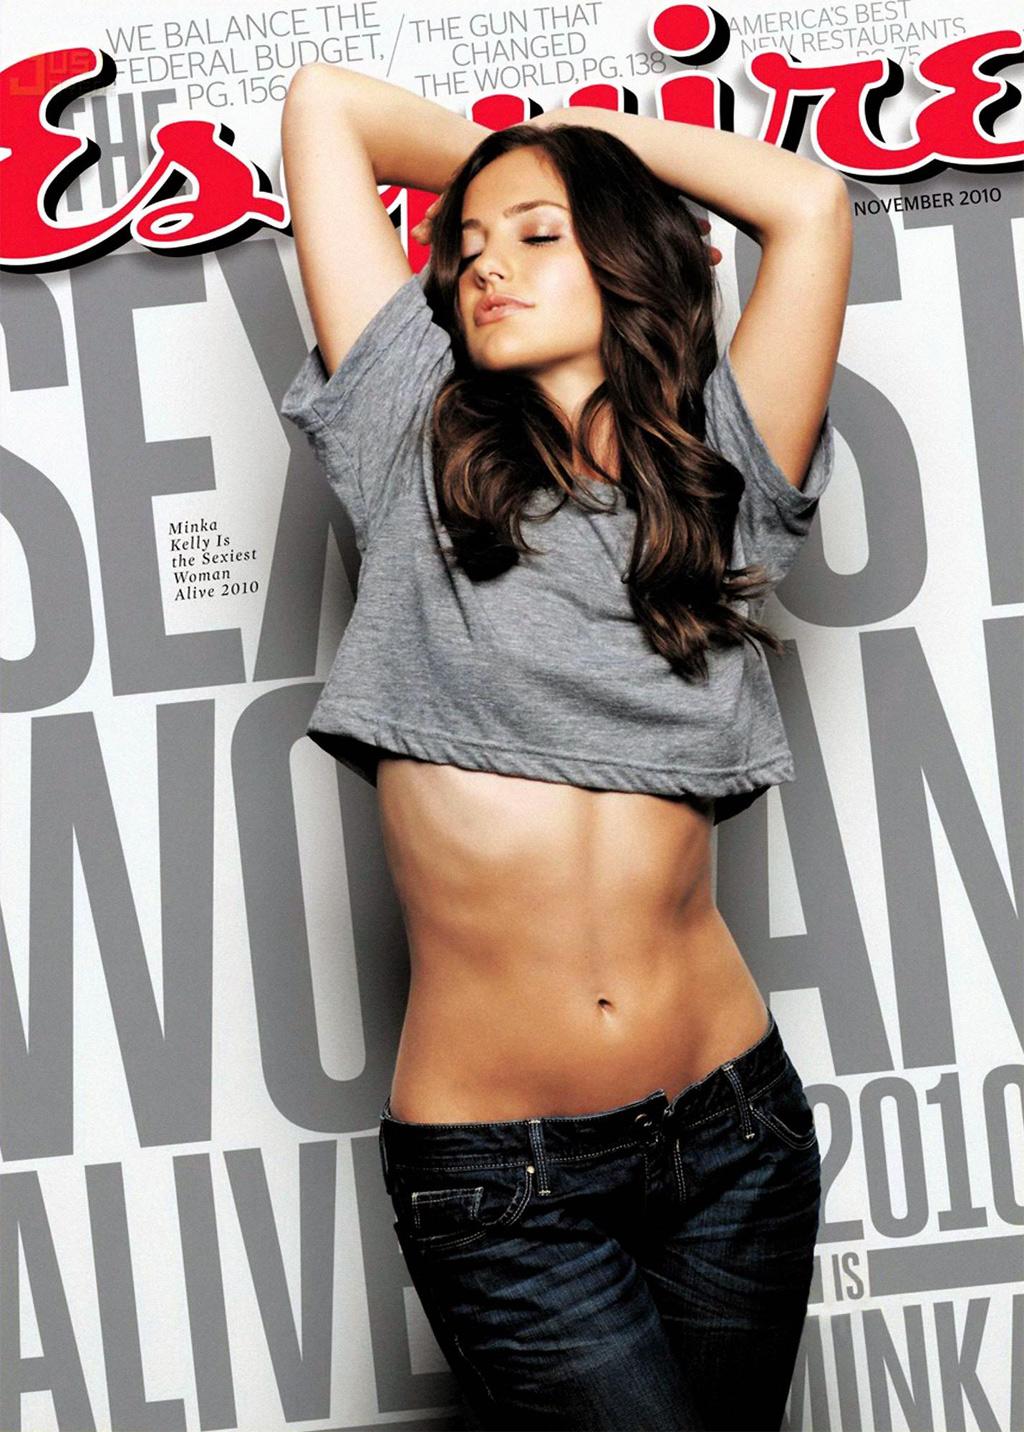 Kelly minka sexiest woman alive join